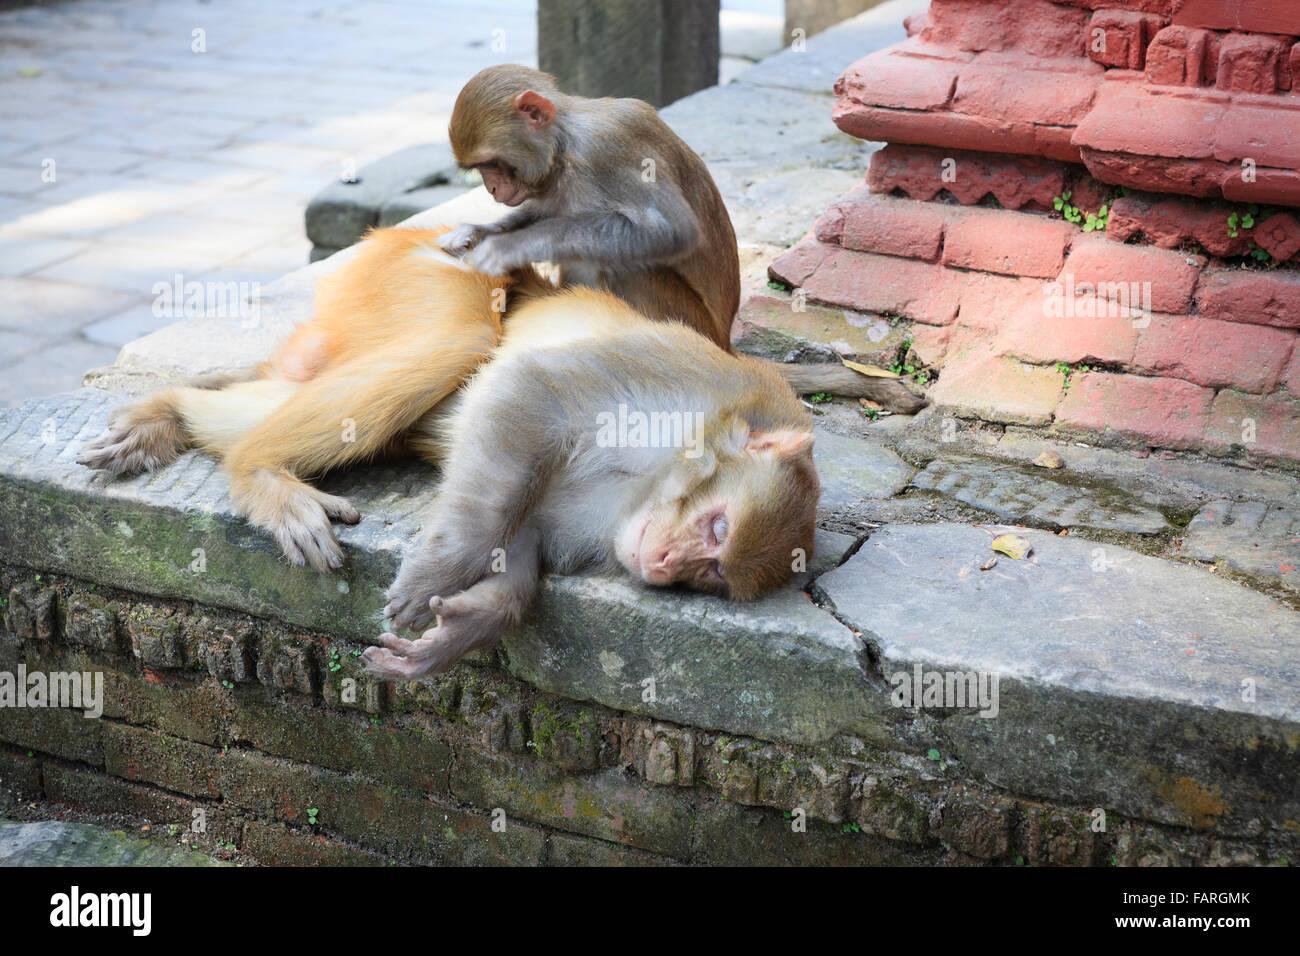 Rhesus Macaque (Macaca mulatta) grooming in the Pashupatinath Temple. Kathmandu. Nepal. - Stock Image